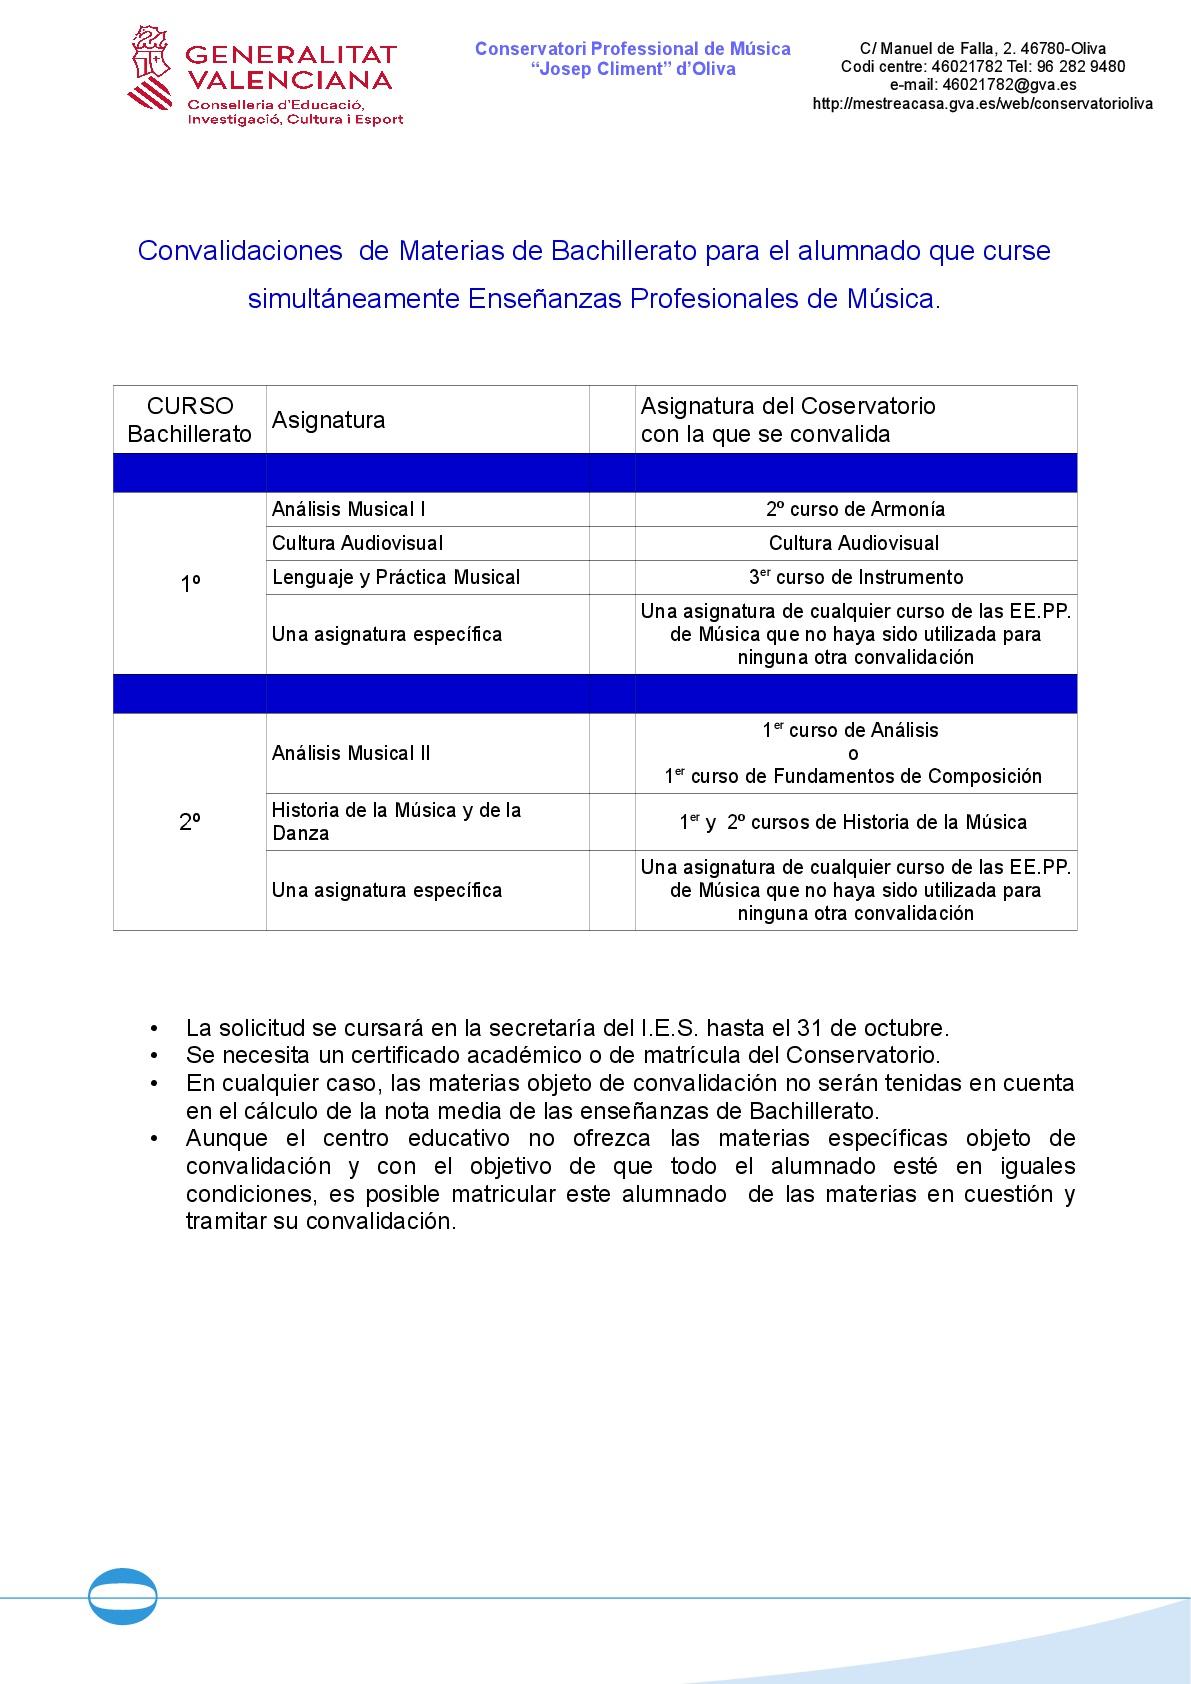 Convalidaciones de Bachillerato 2018-001